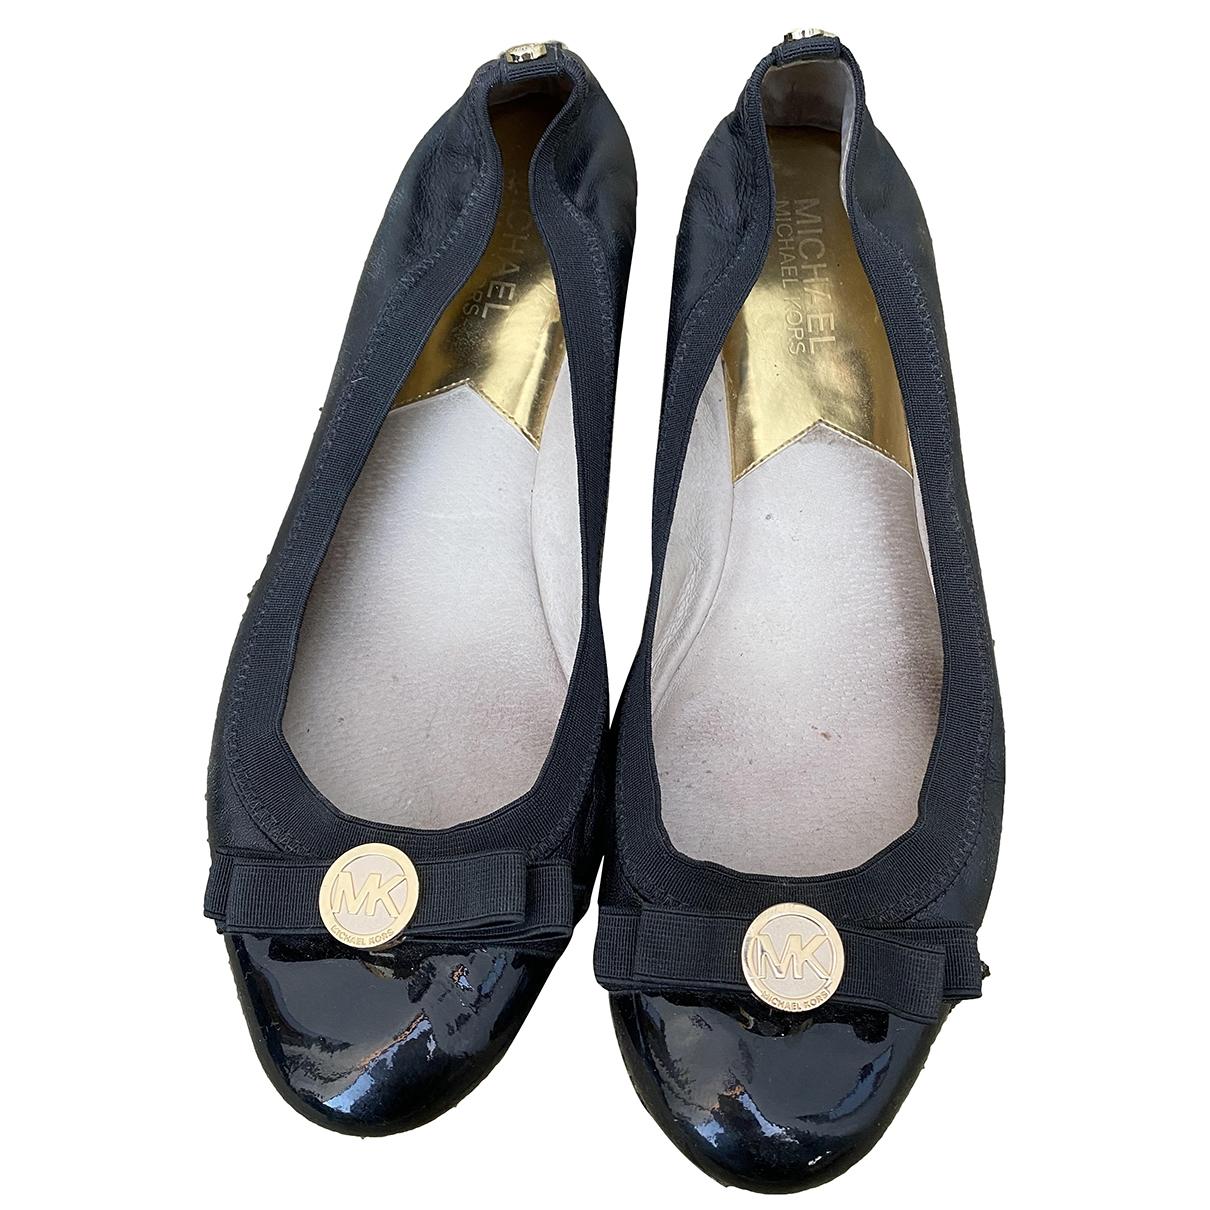 Bailarinas de Charol Michael Kors